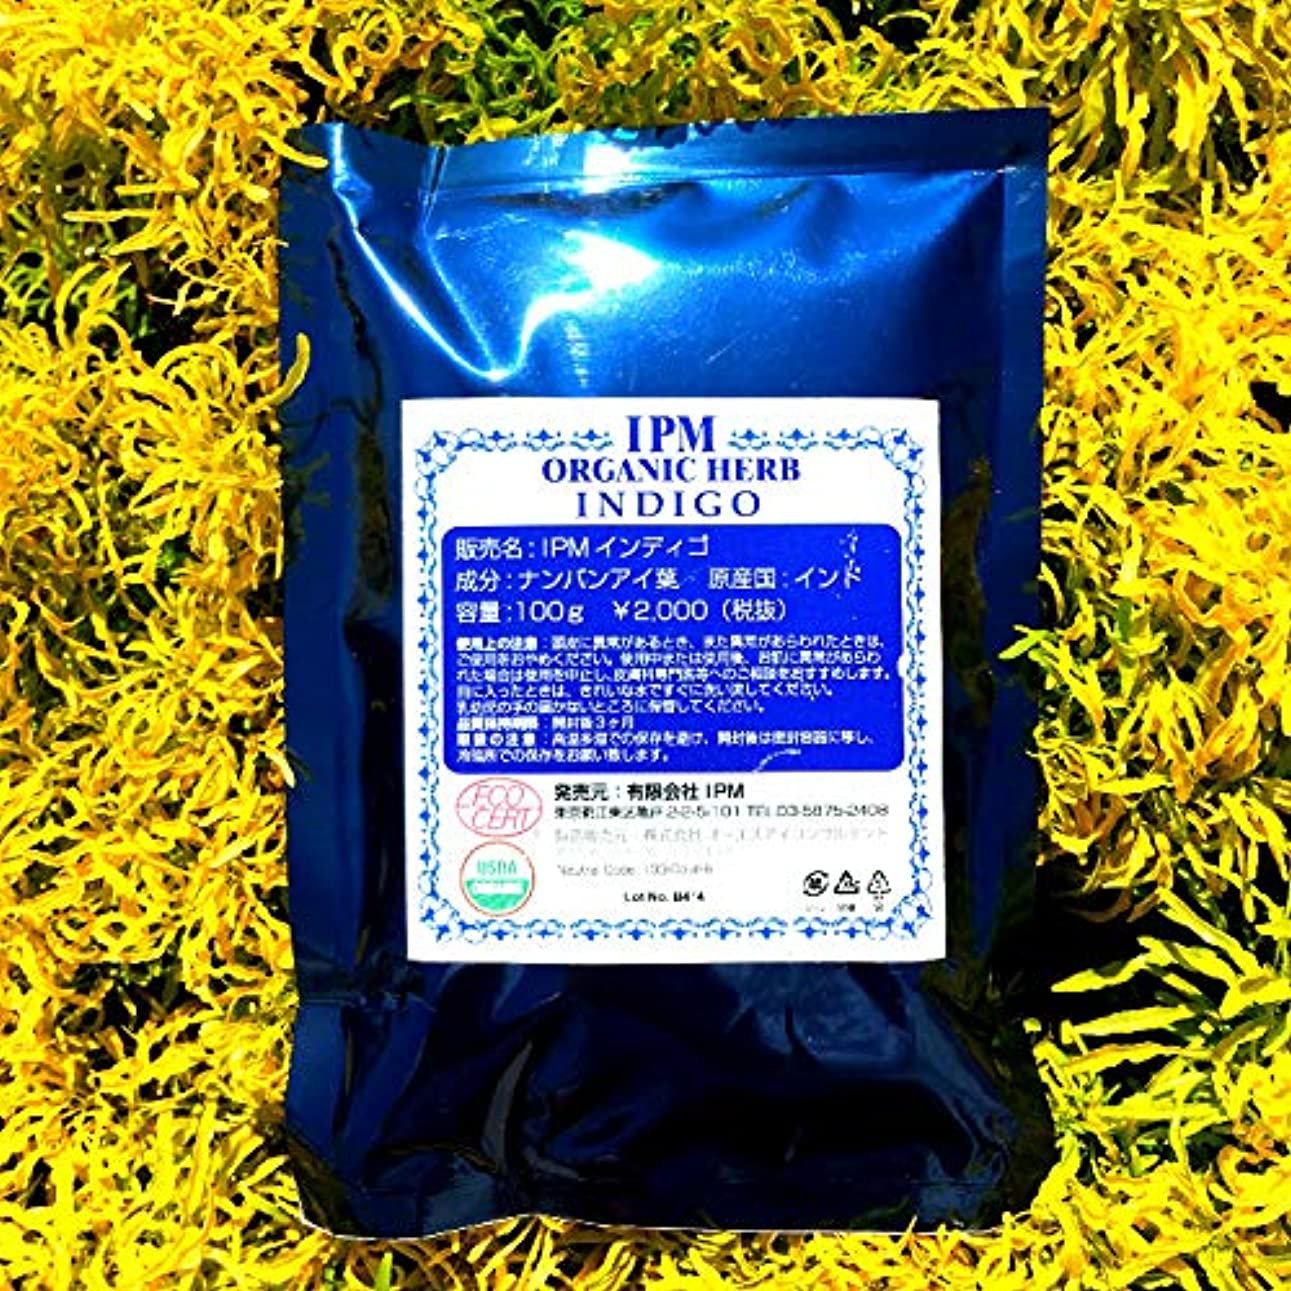 IPM インディゴ 500g (100g×5)